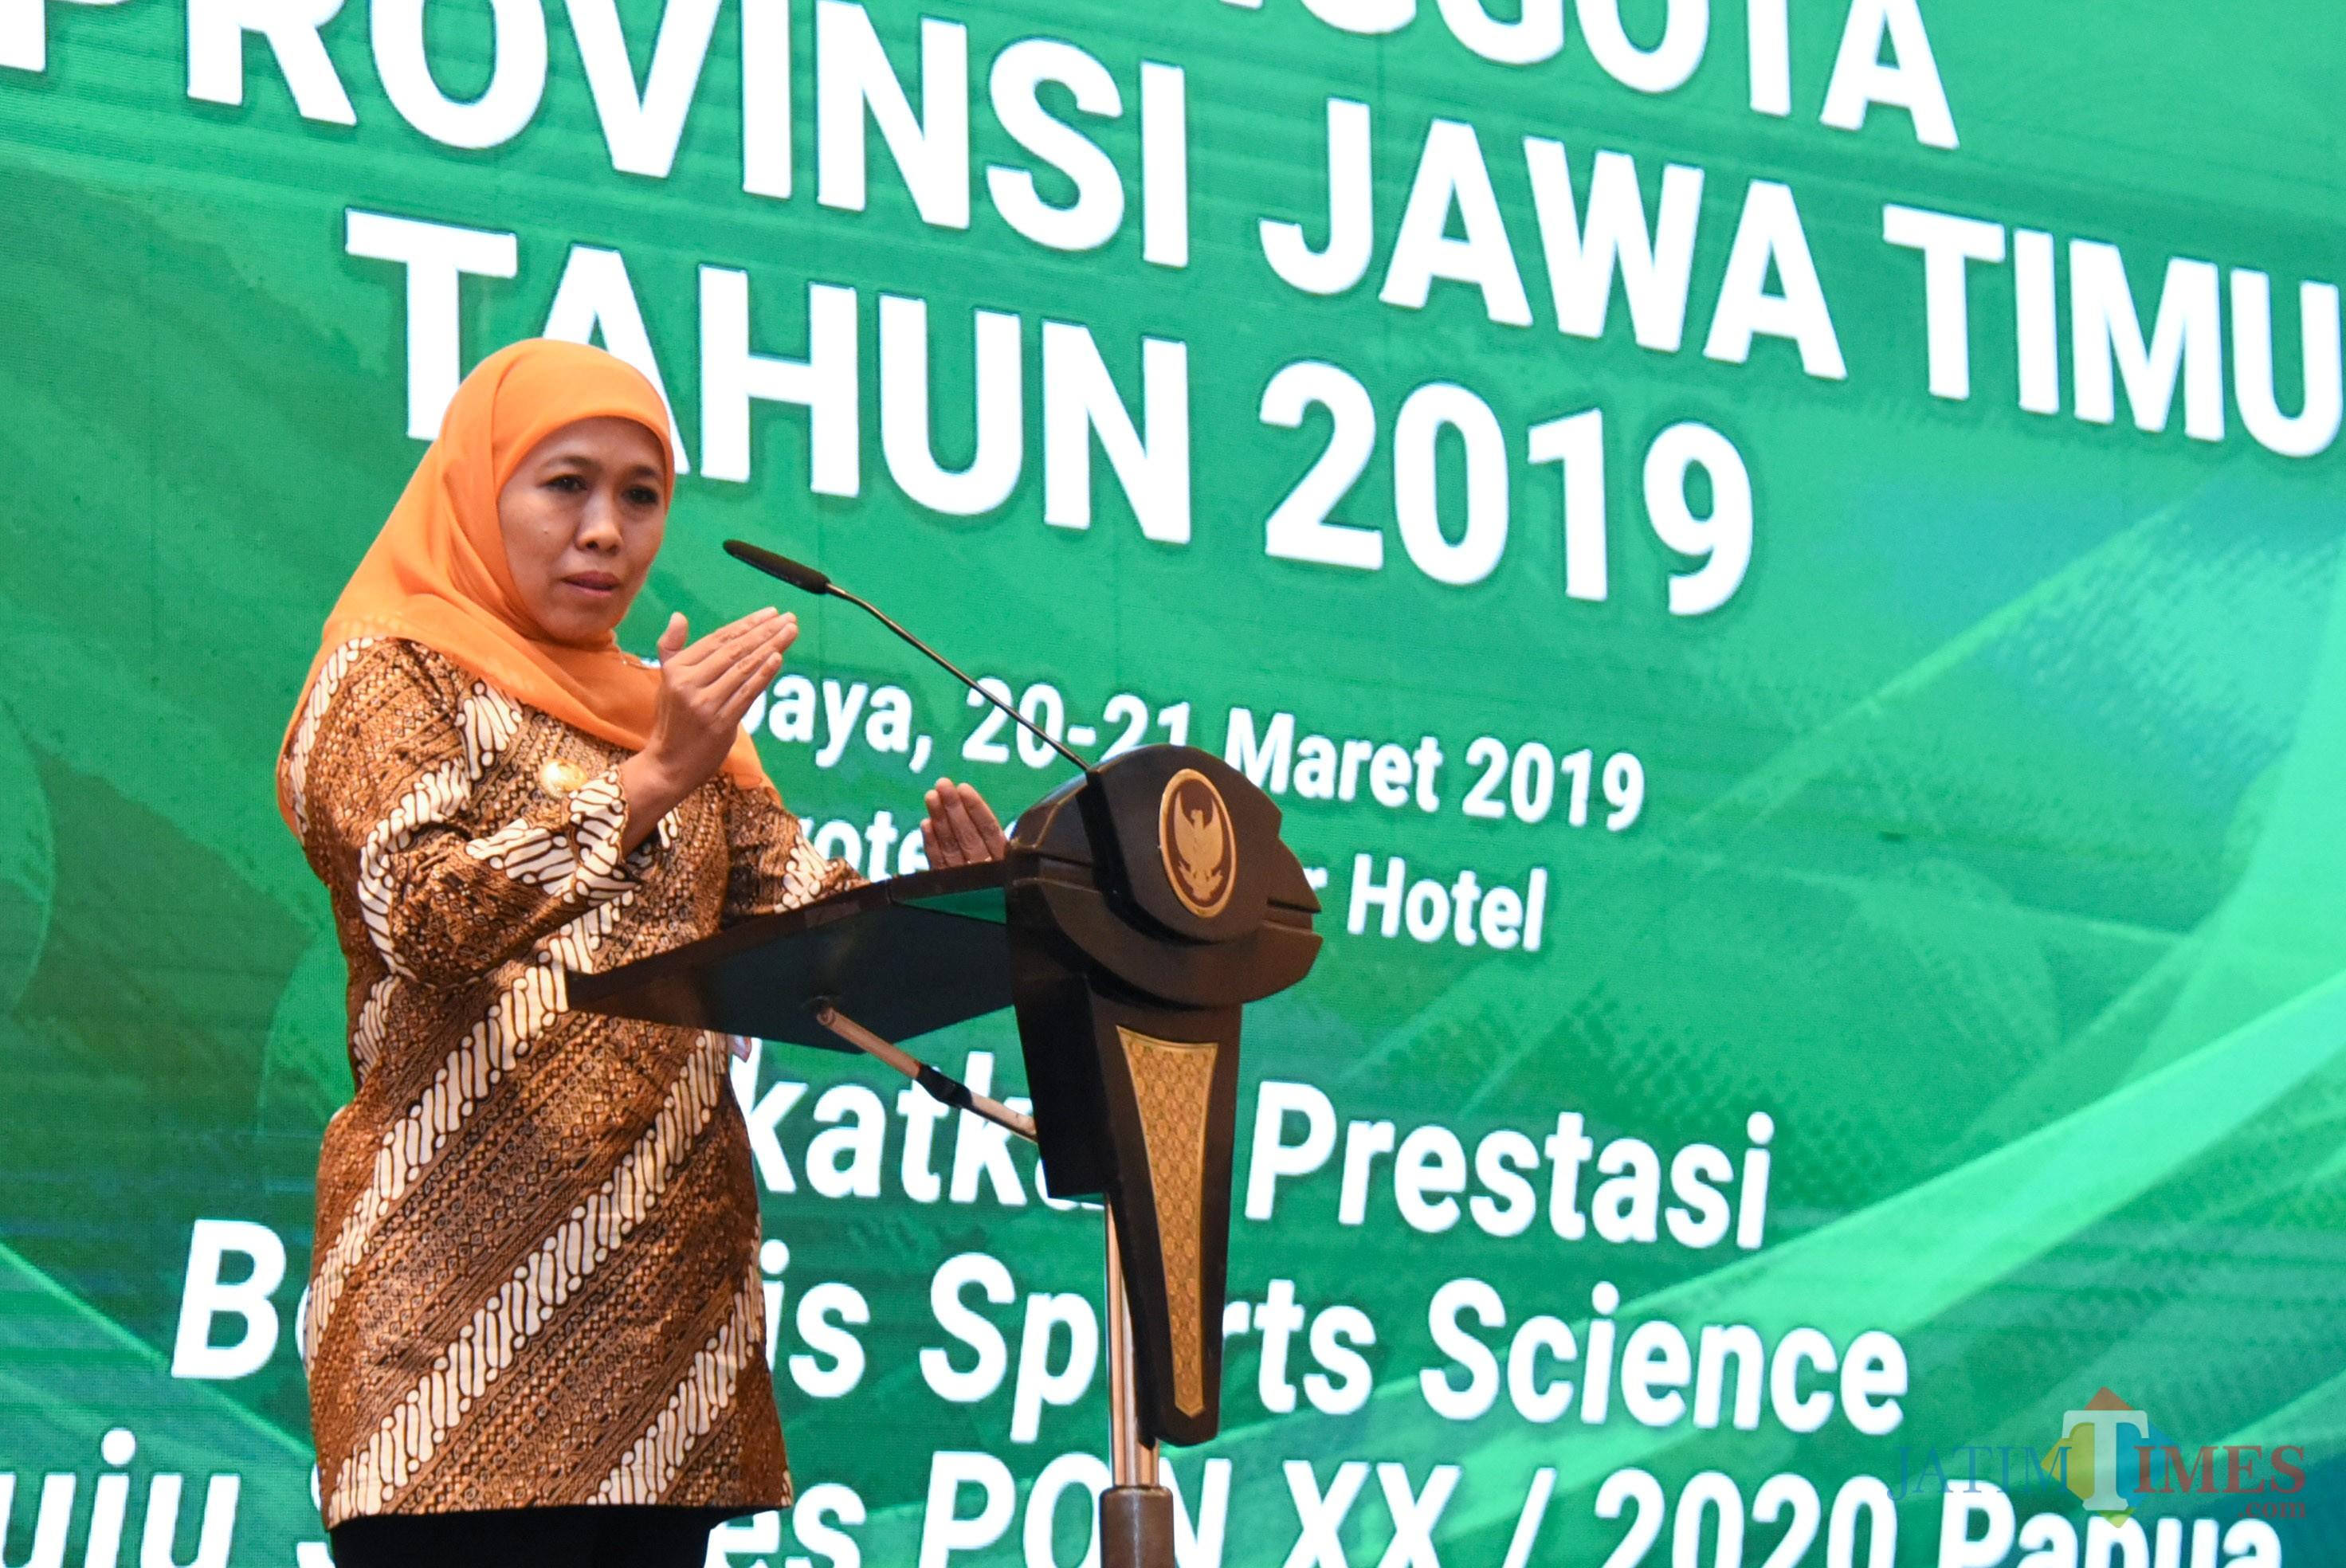 Gubernur Jatim saat membuka Rapat Anggota KONI Provinsi Jawa Timur Tahun 2019 di Hotel Novotel Samator, Surabaya, Rabu (20/03).